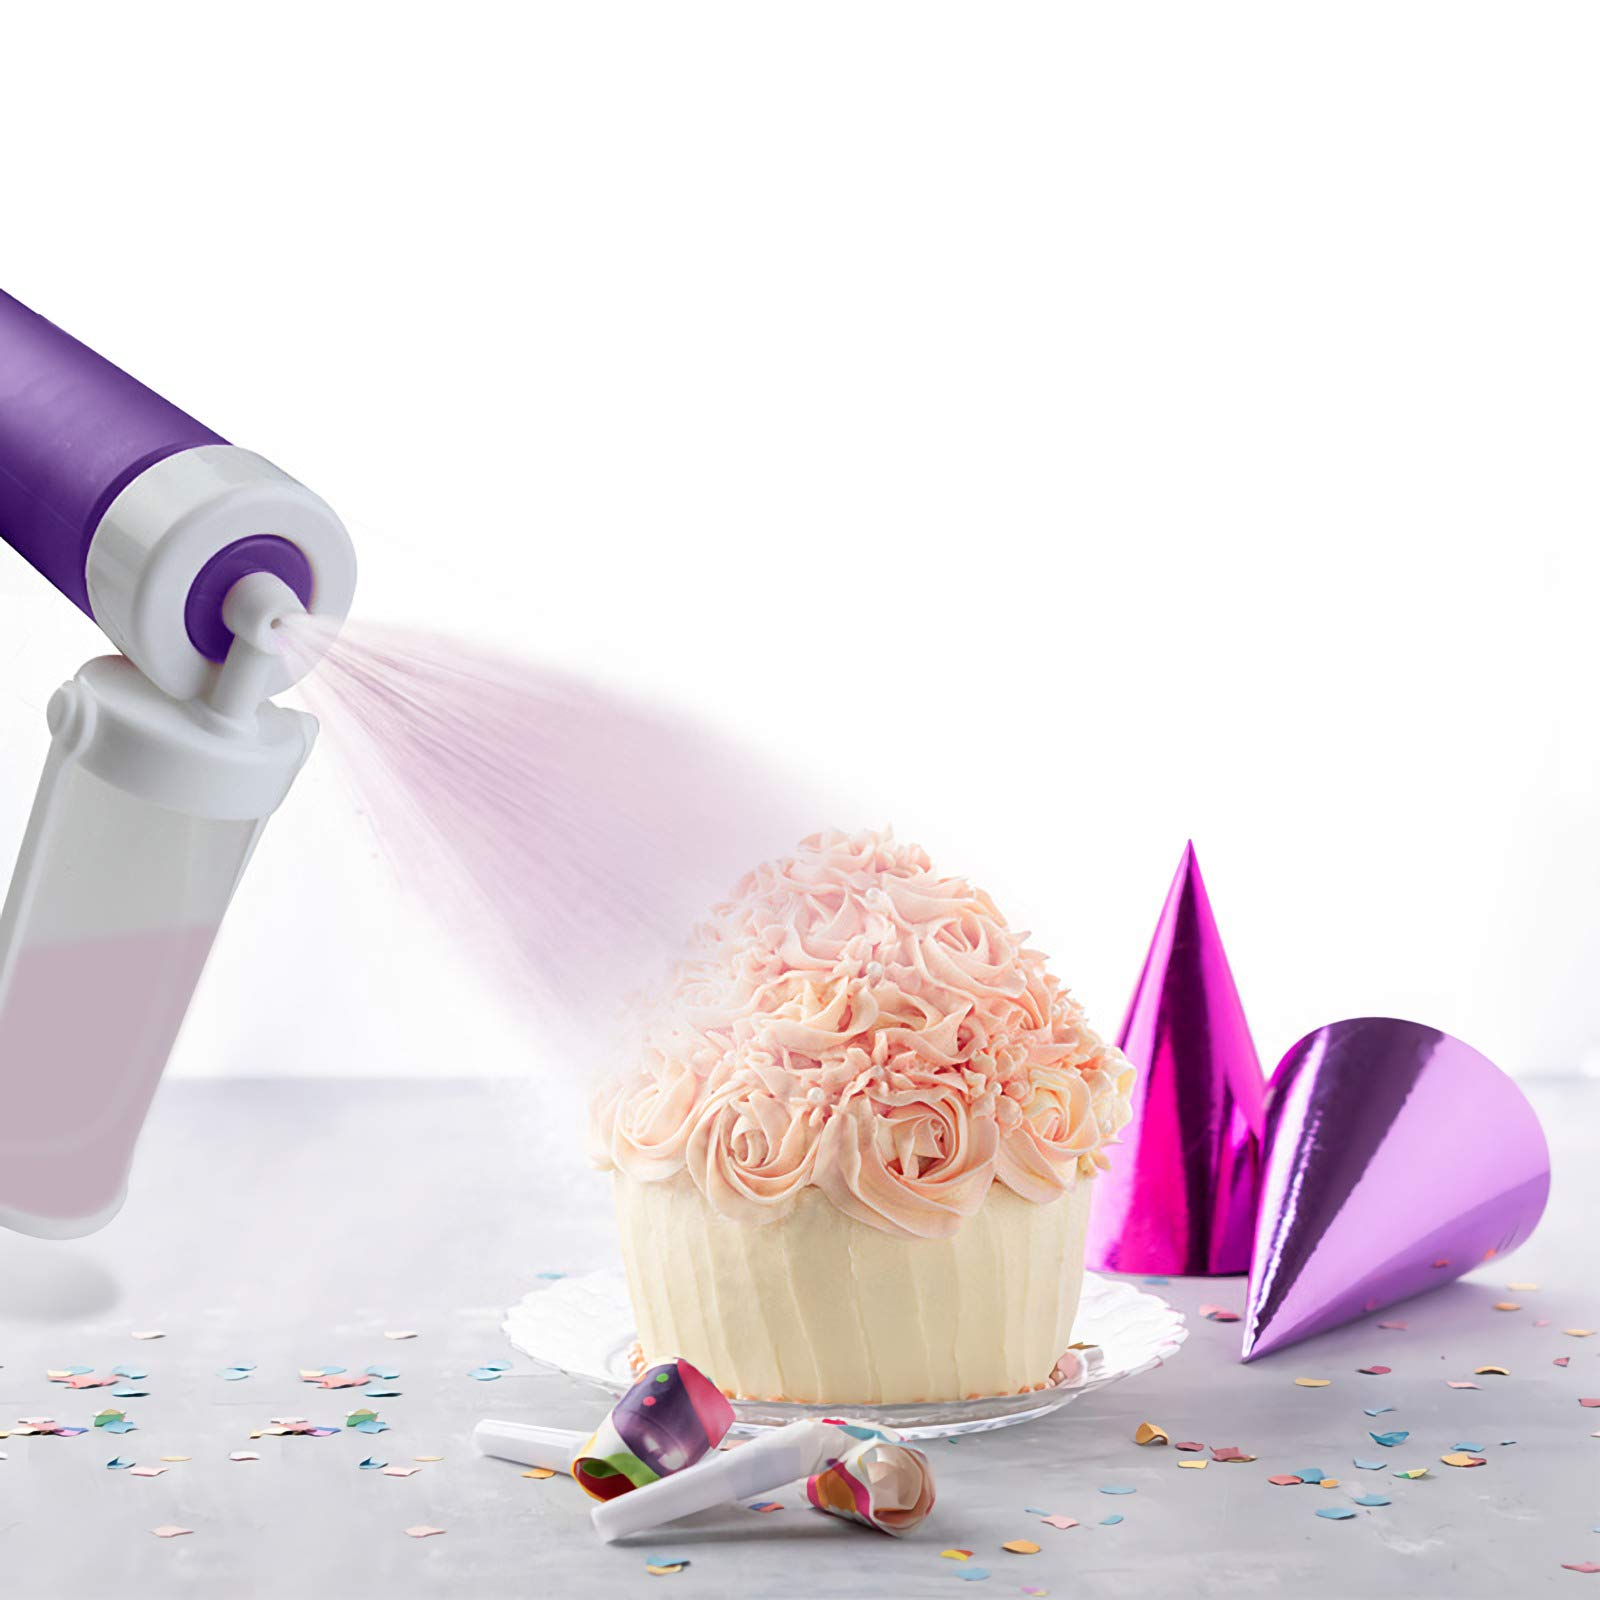 Handheld Airbrush Cake Coloring Duster - Food-Grade Plastic Spray Guns Cake Syringe Pen Sprinkles Decorating Set Dessert Candy Sculpting Tools - 4 Spare Spray Pump (Pink)